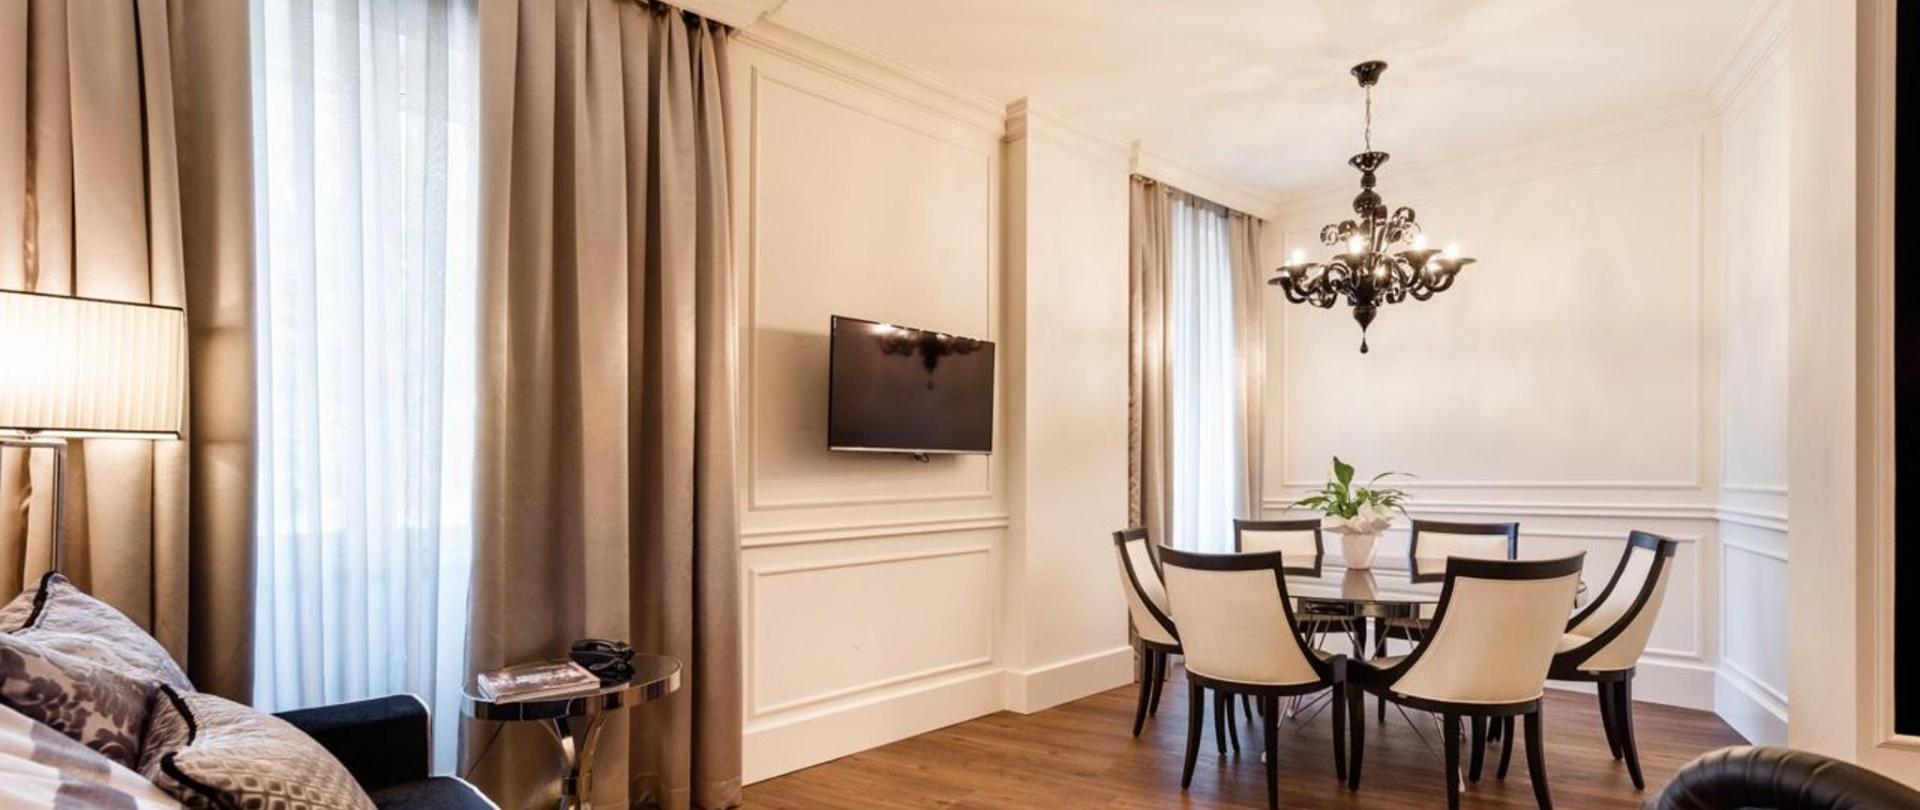 Aparthotel Casa di Verona